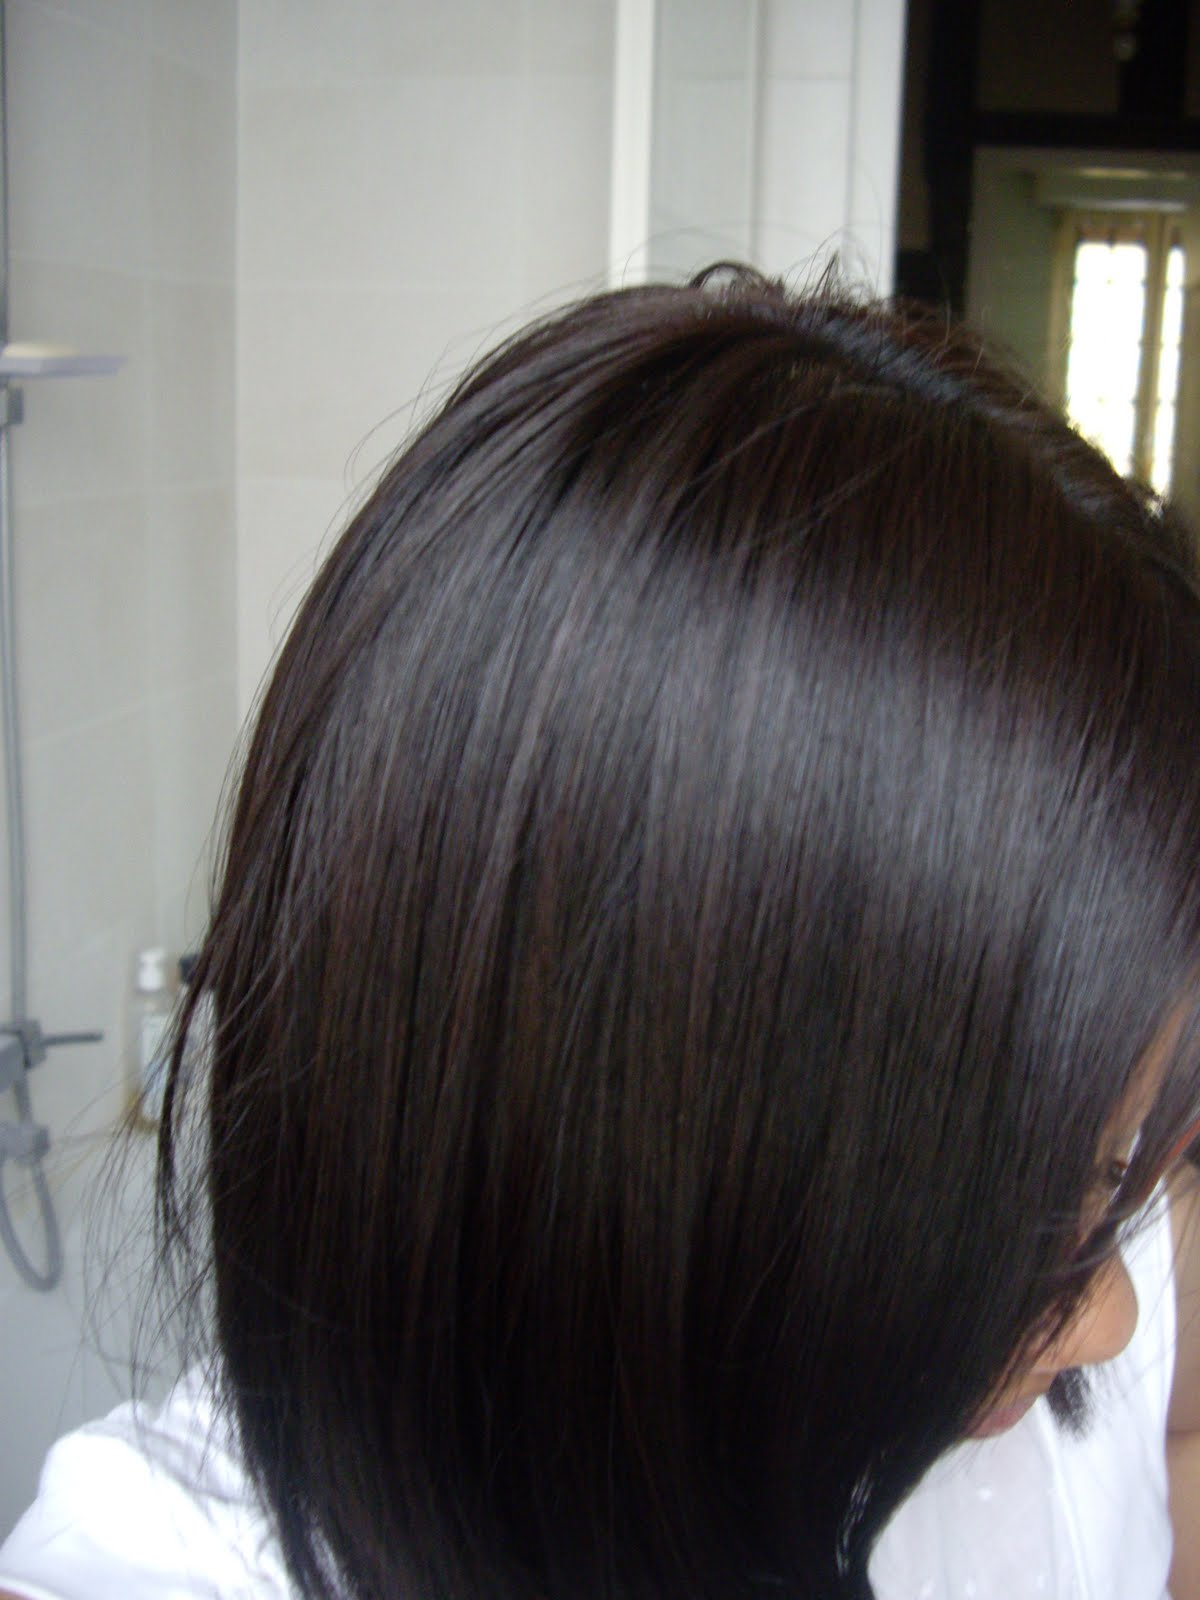 balayage sur cheveux noir cheap balayage cuivr cheveux courts with balayage sur cheveux noir. Black Bedroom Furniture Sets. Home Design Ideas